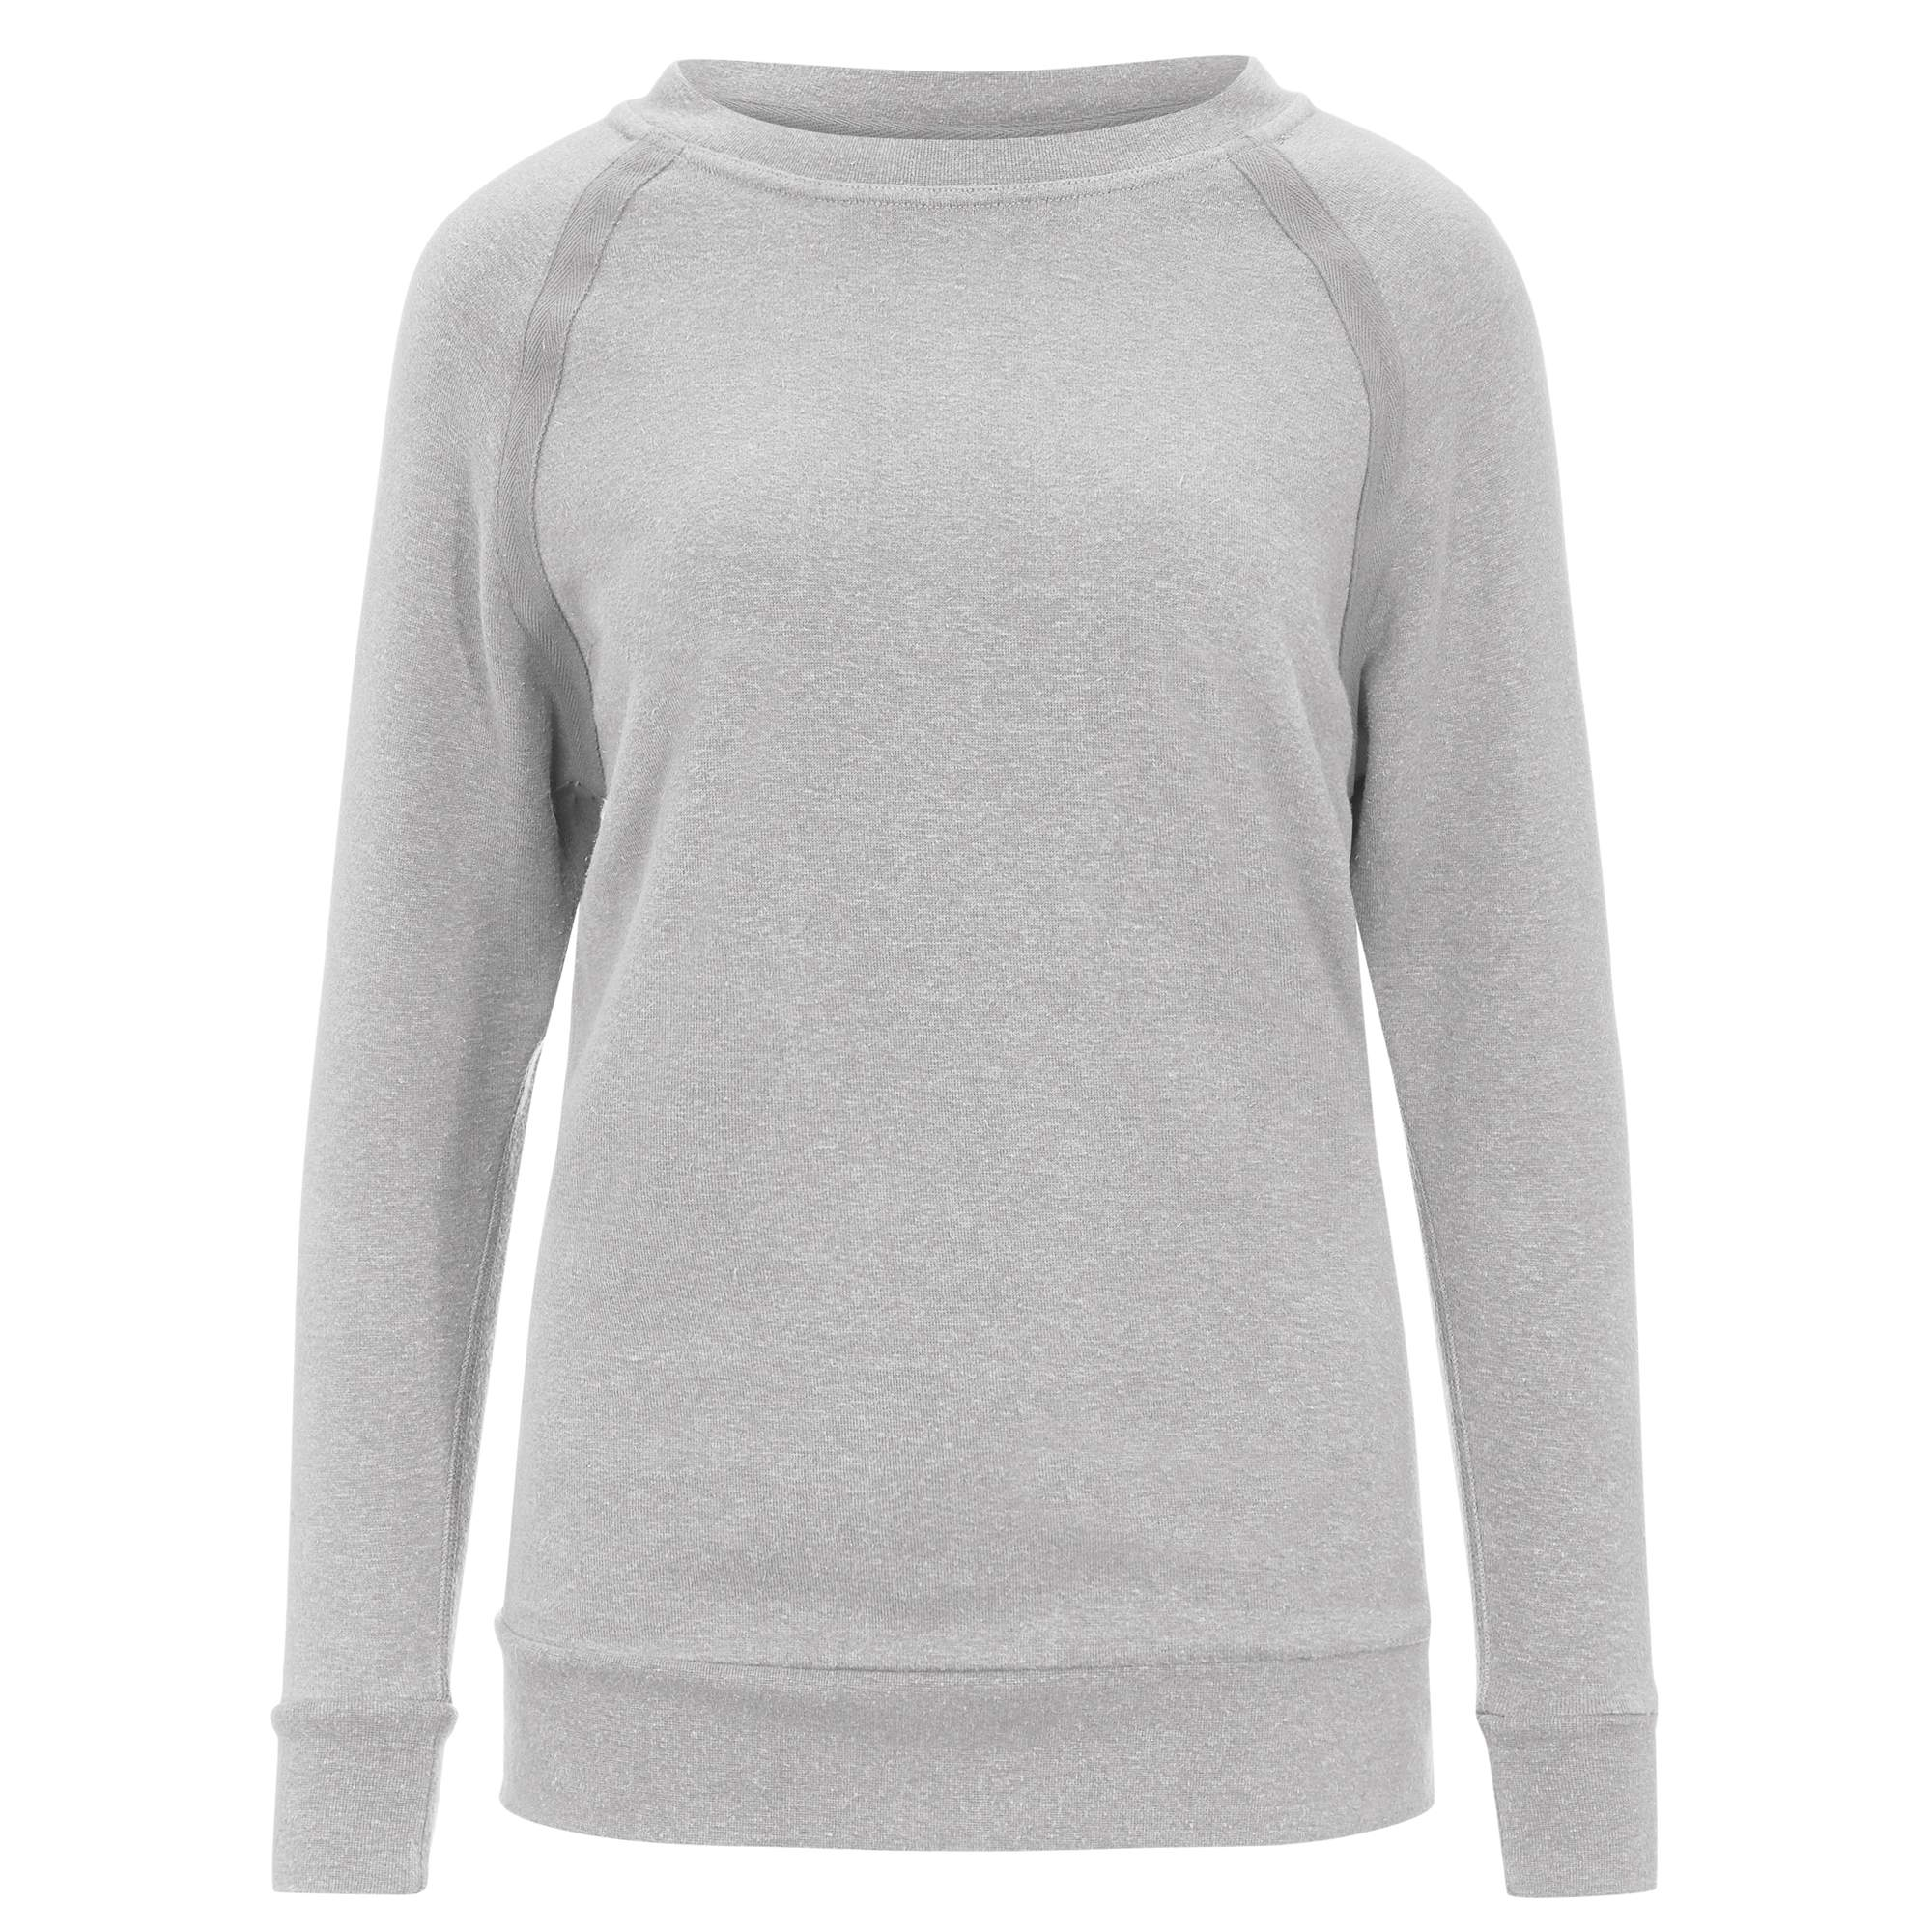 Prana COZY UP SWEATSHIRT Frauen Gr. L - Sweatshirt - grau